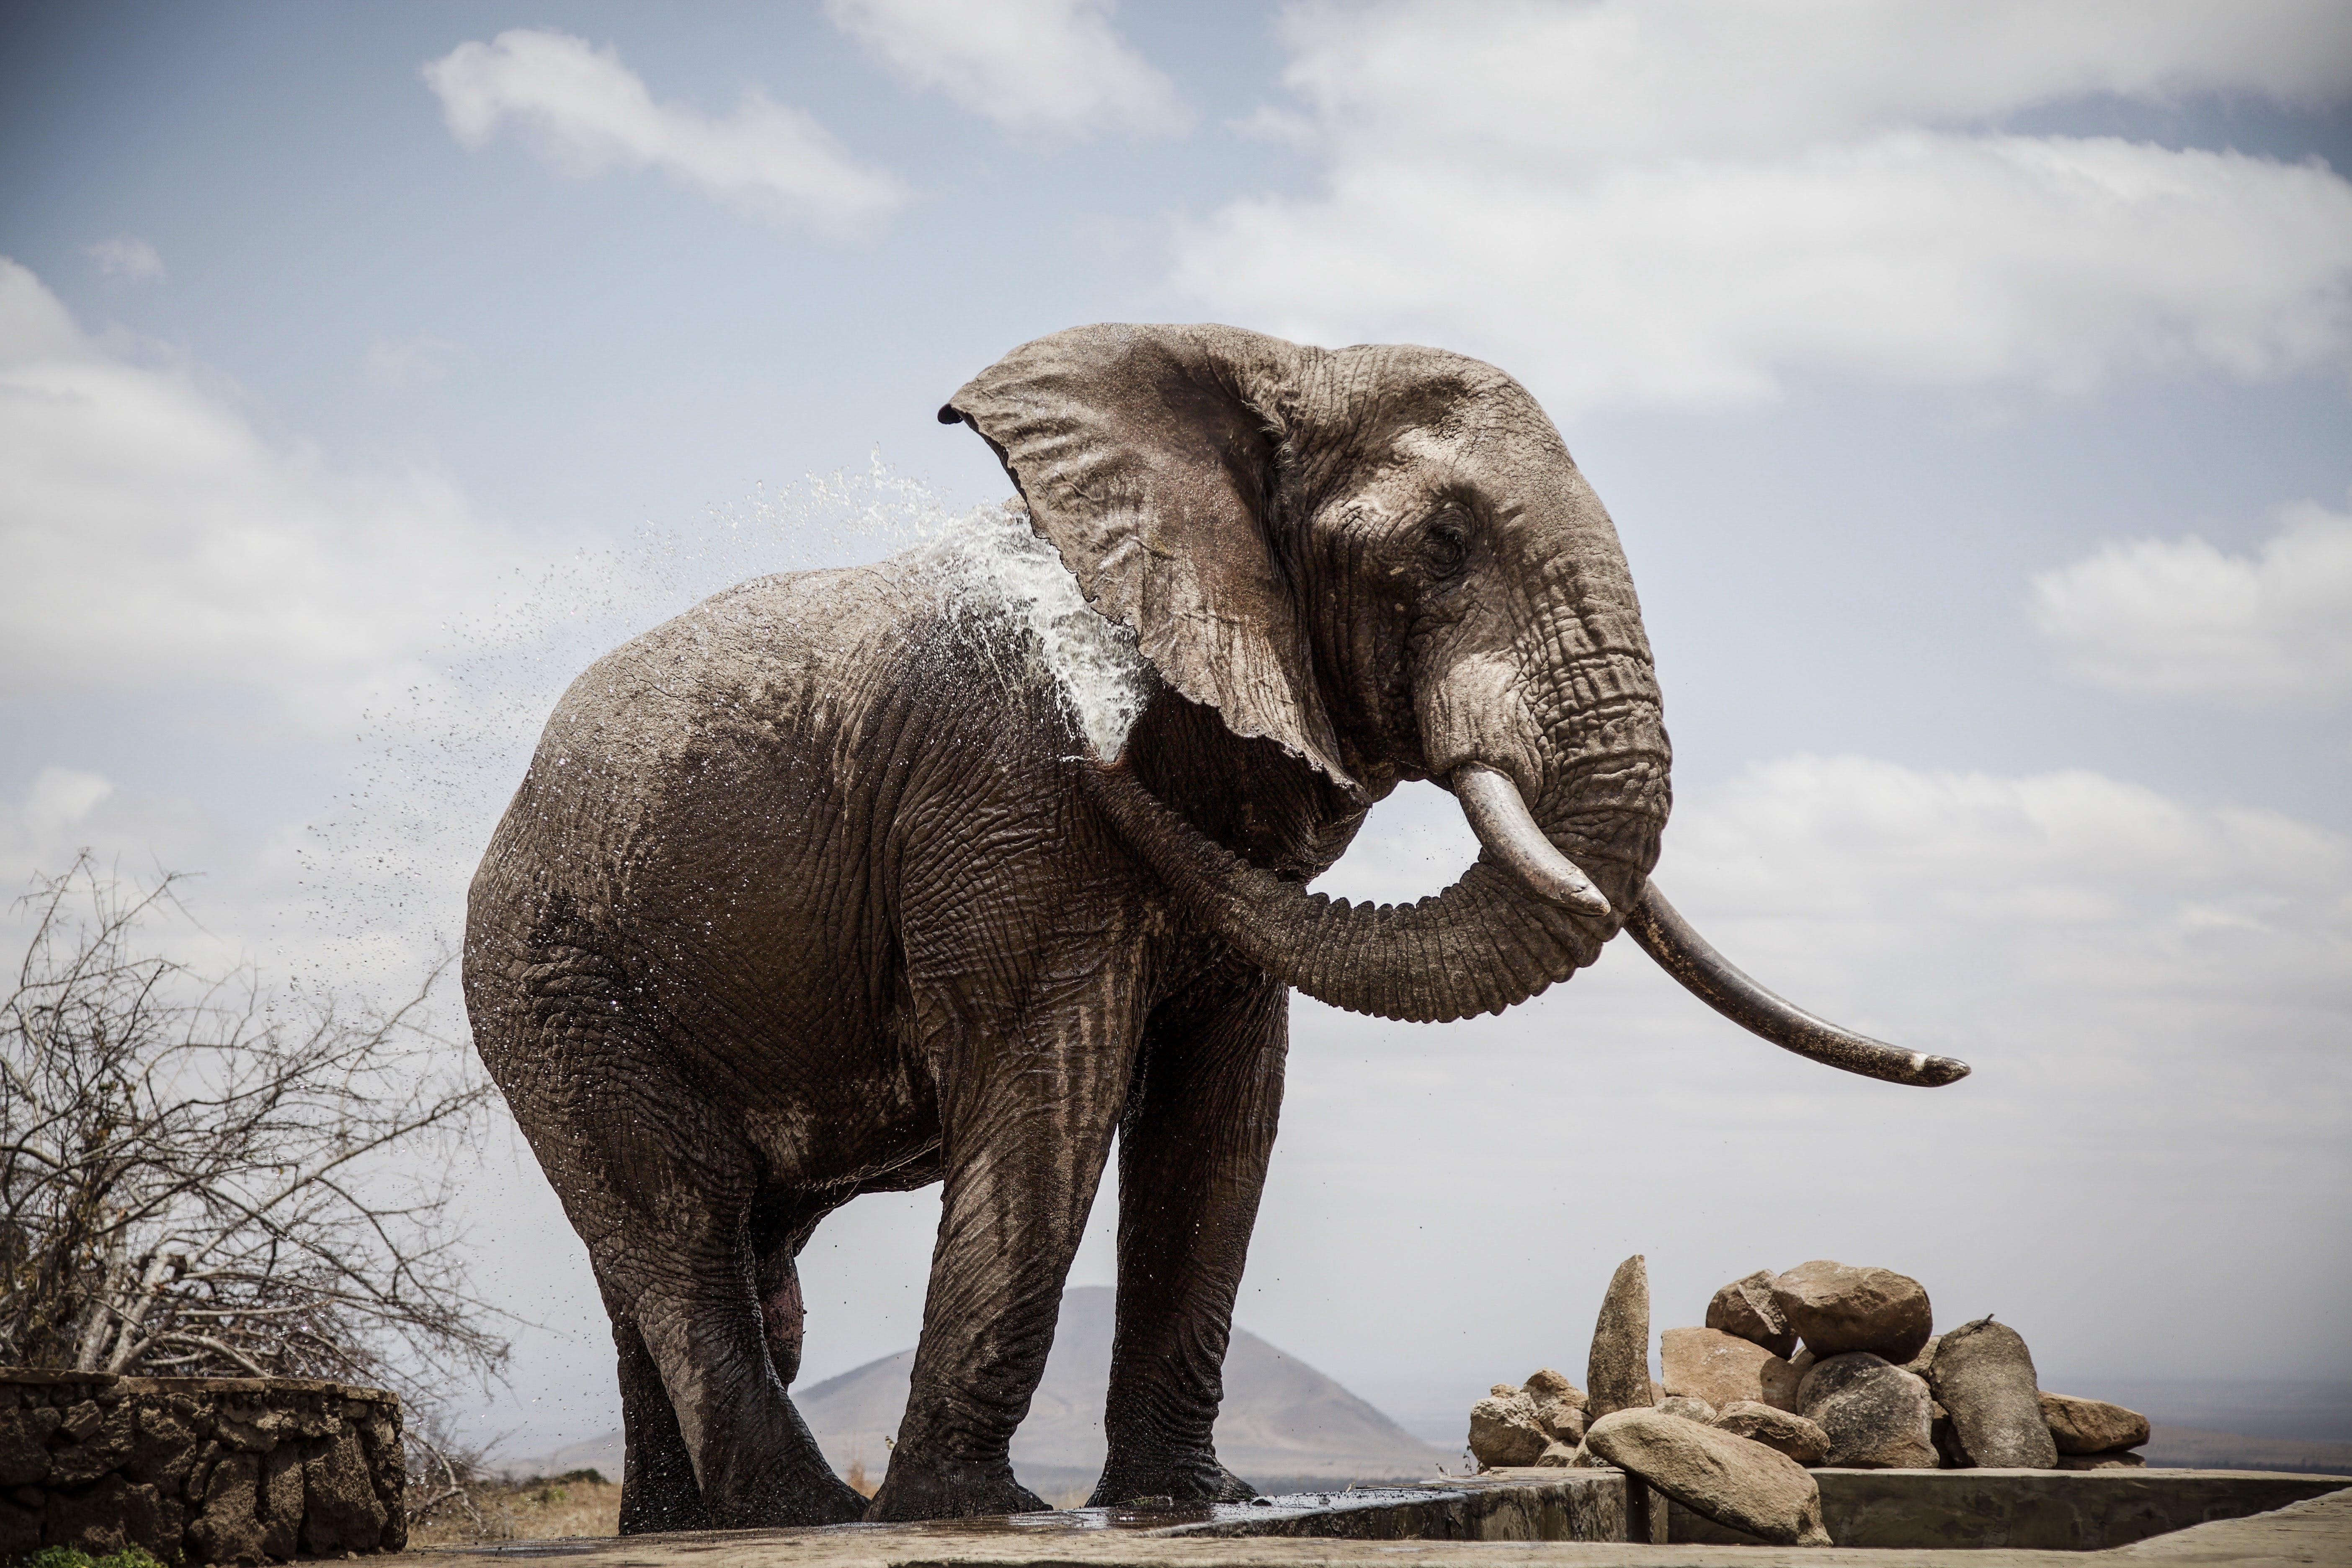 Elephant Standing Near Pile of Stones